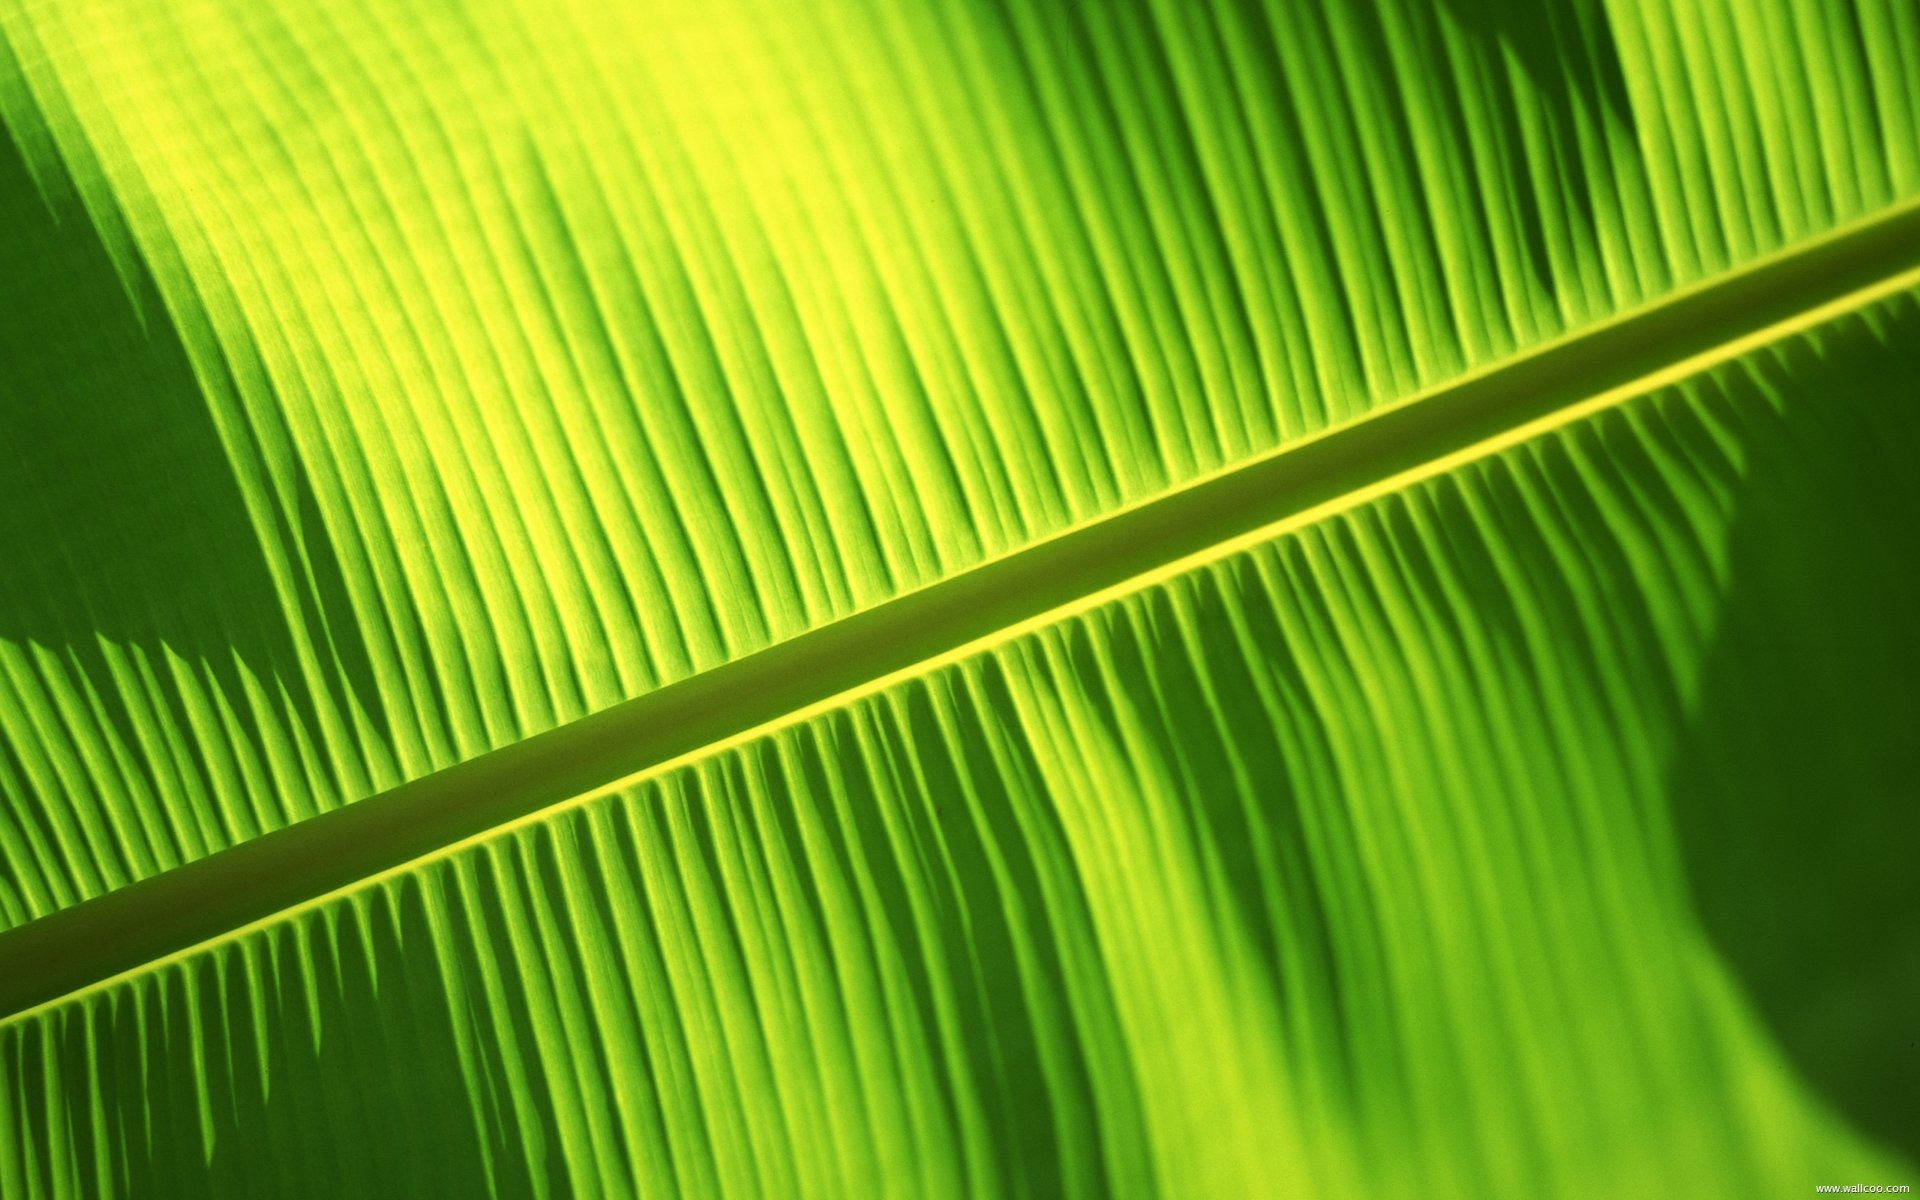 Banana Leaf Background Pic Hd - 1920x1200 - Download HD ...